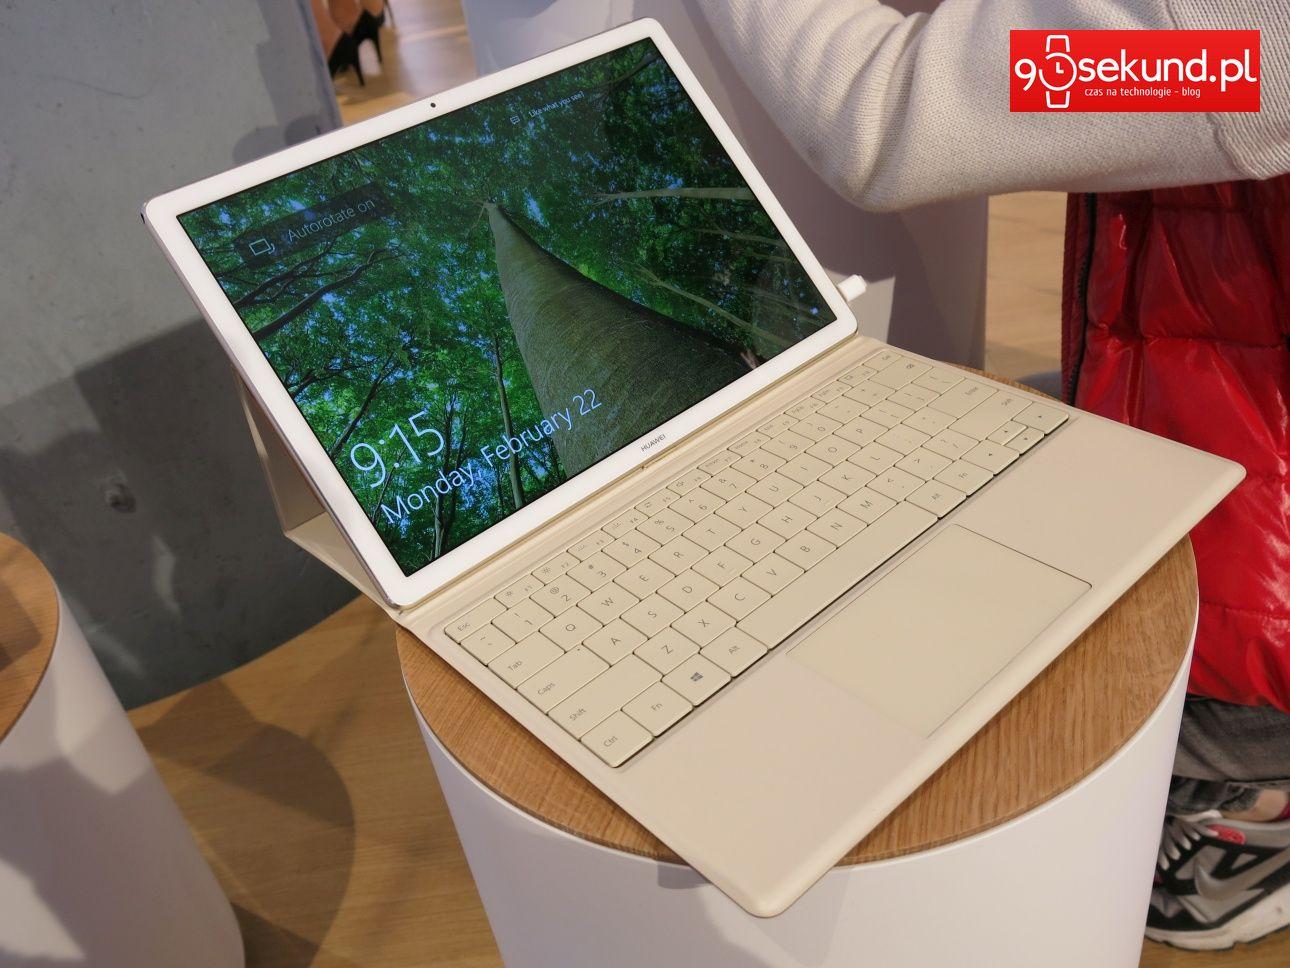 Huawei MateBoo - 90sekund.pl